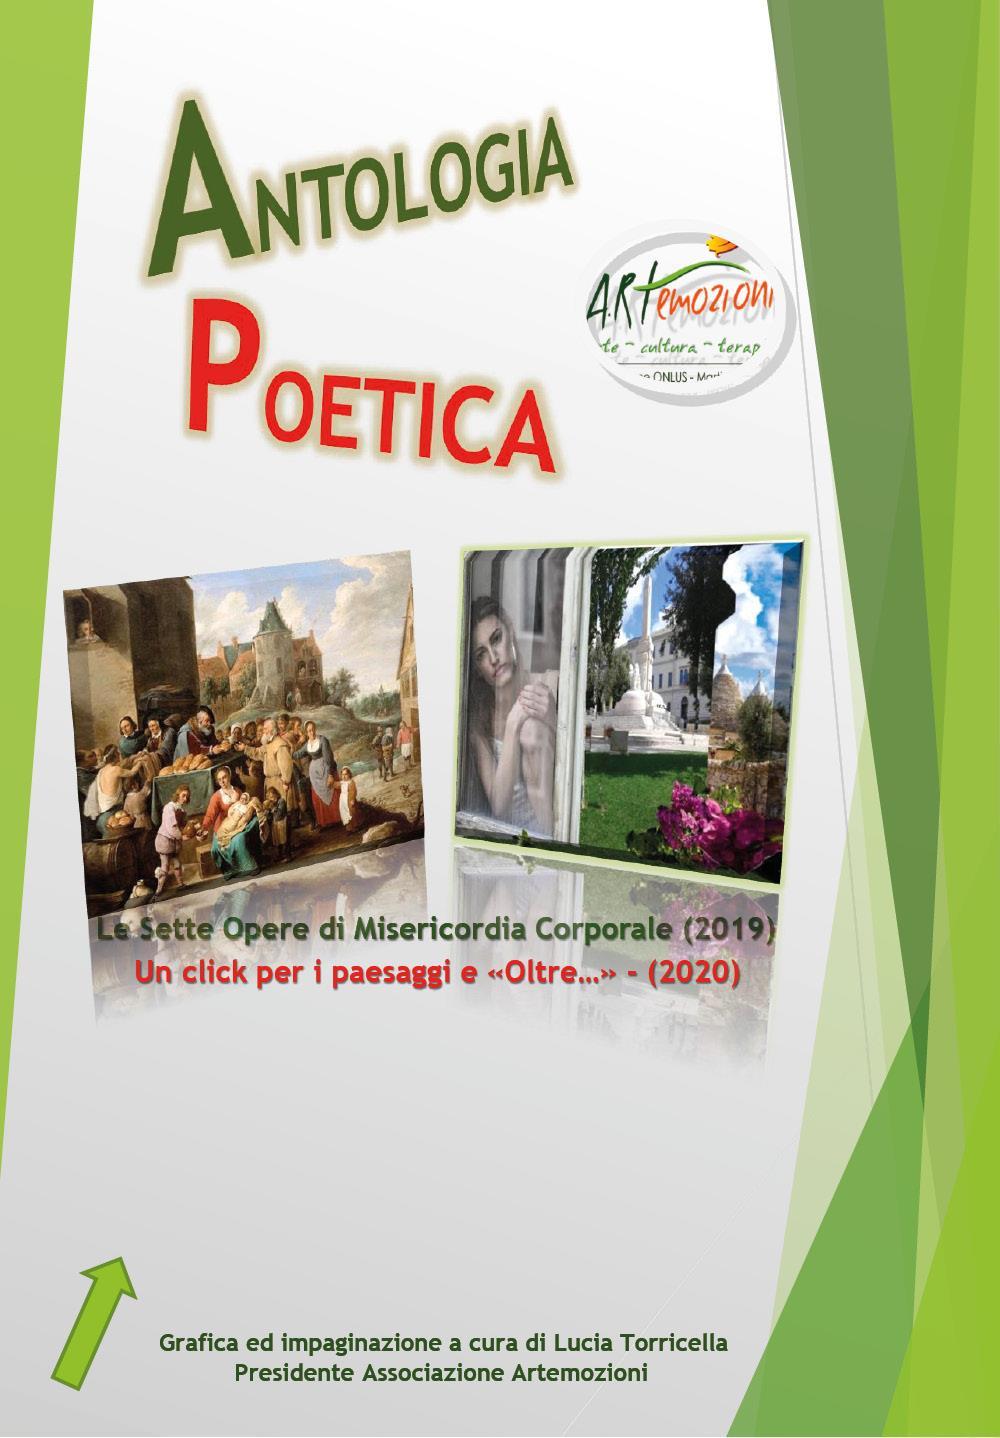 Antologia poetica (Biennale 2019-2020)